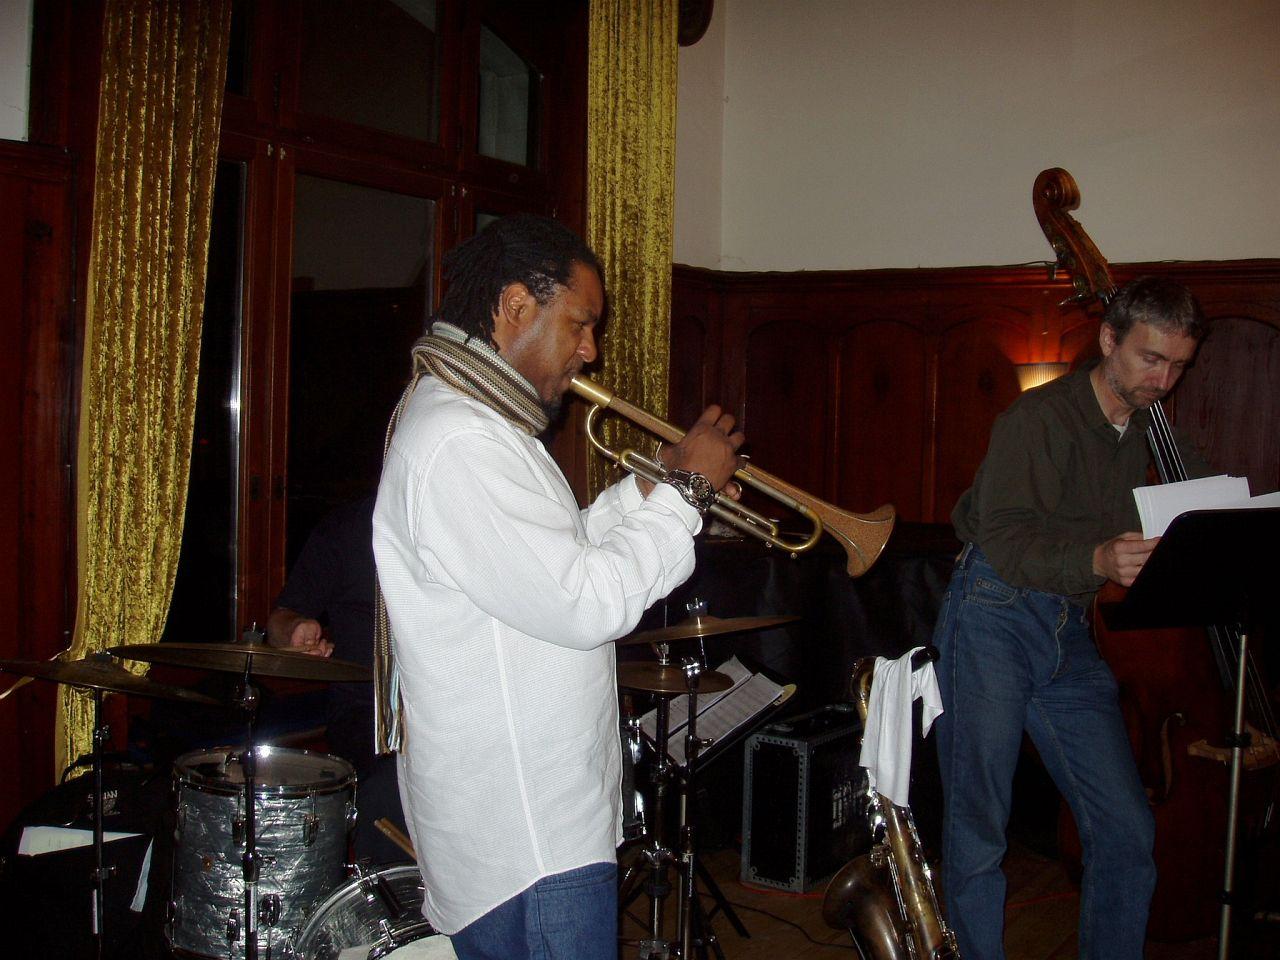 Musiker 367